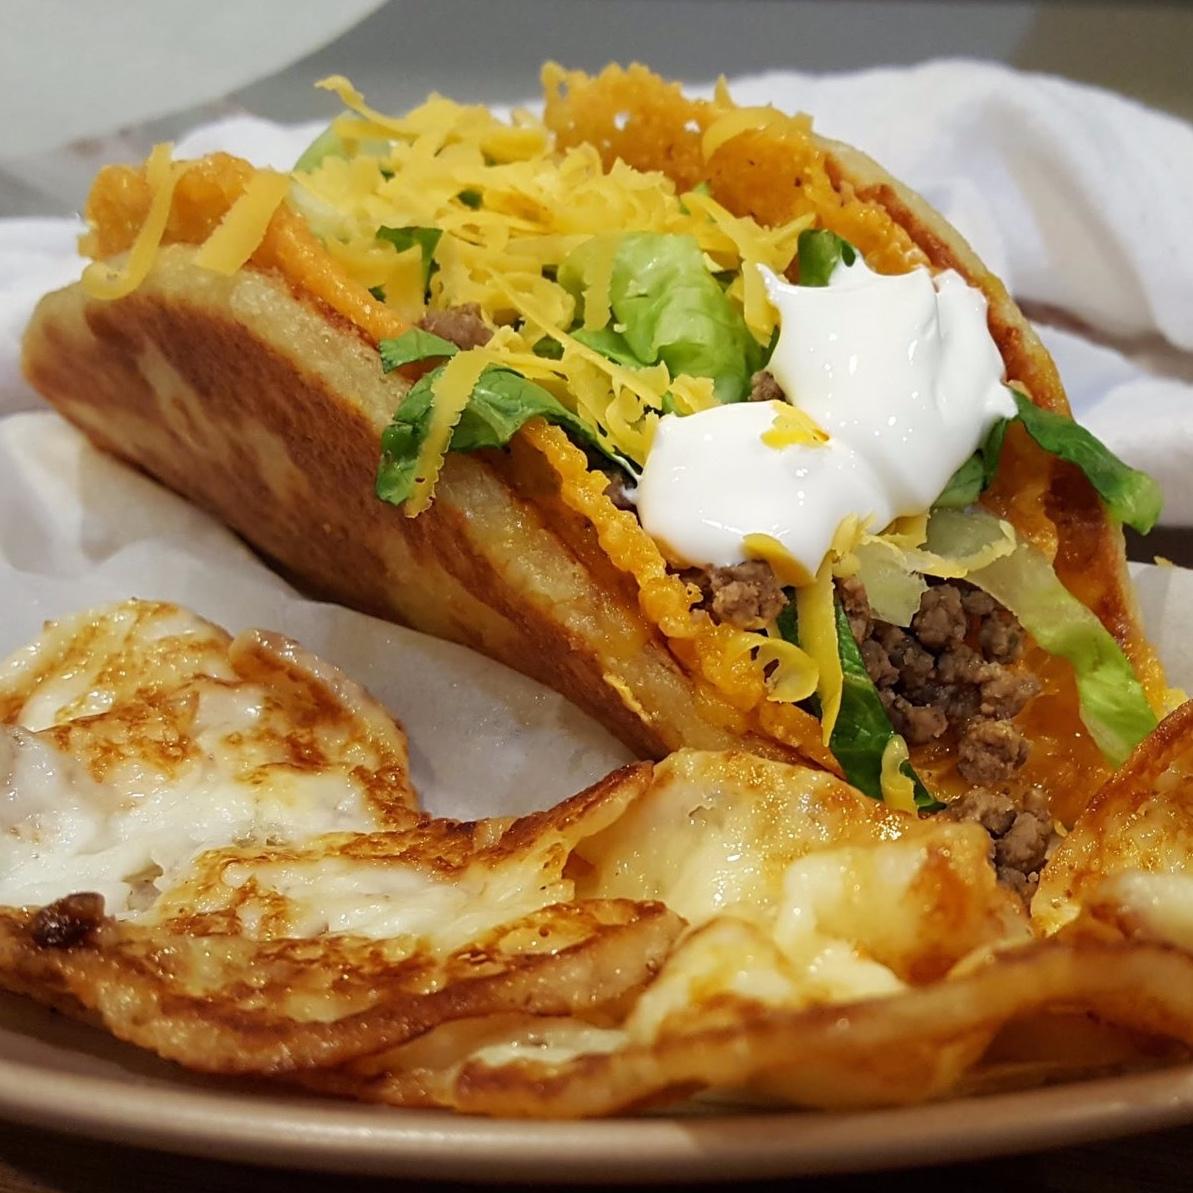 - cheesy gordita crunch